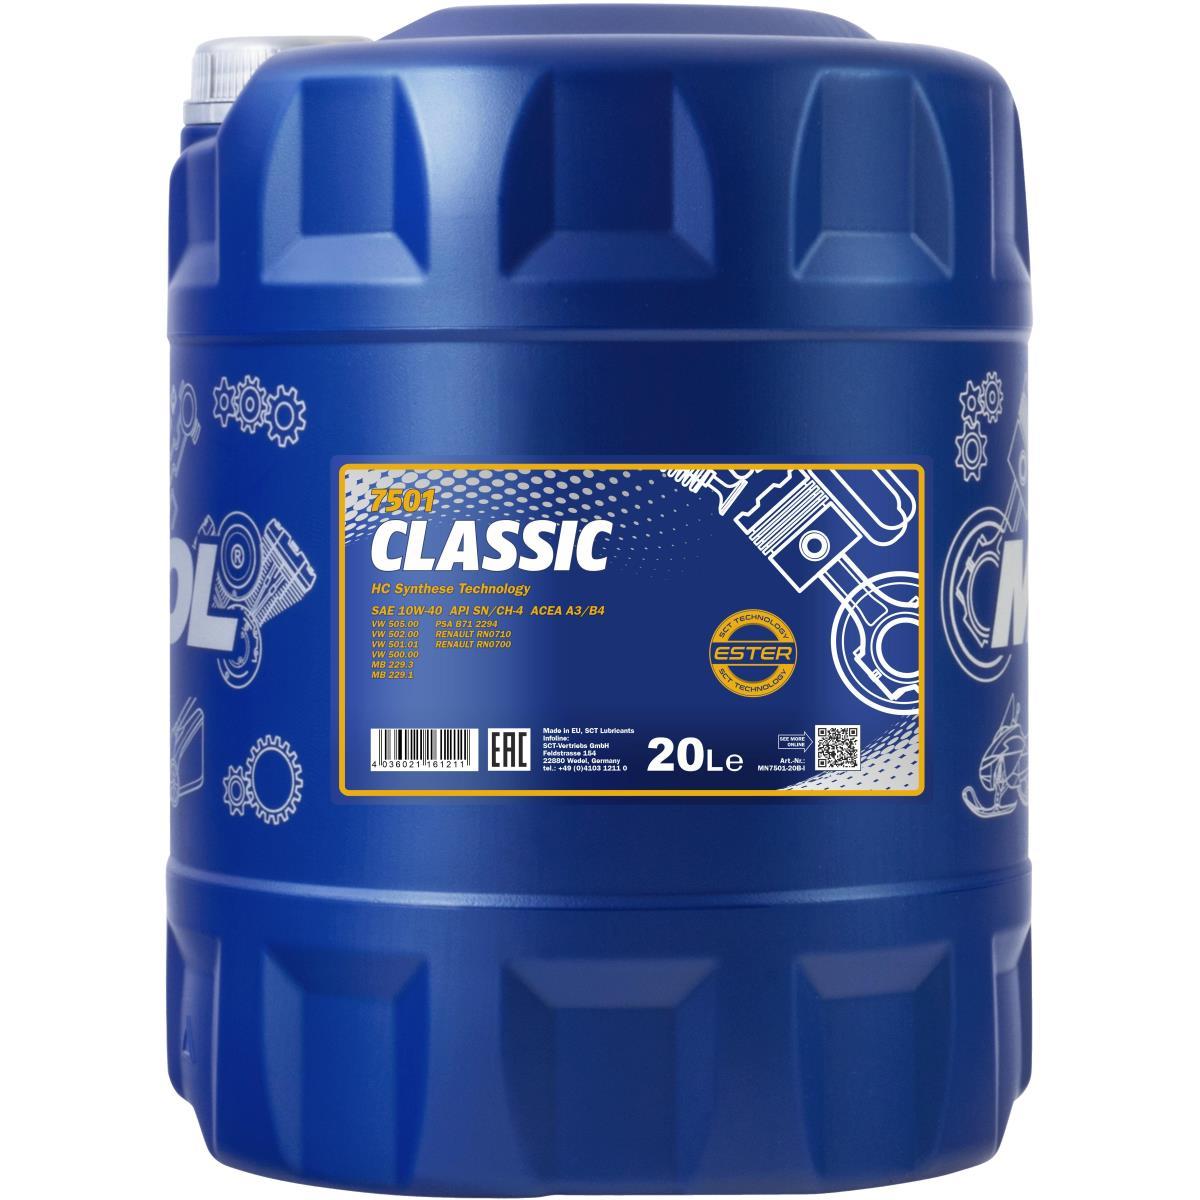 Aceite-del-motor-aceite-5w40-10w40-15w40-5w30-10w60-1l-4l-5l-7l-10l-20l miniatura 7